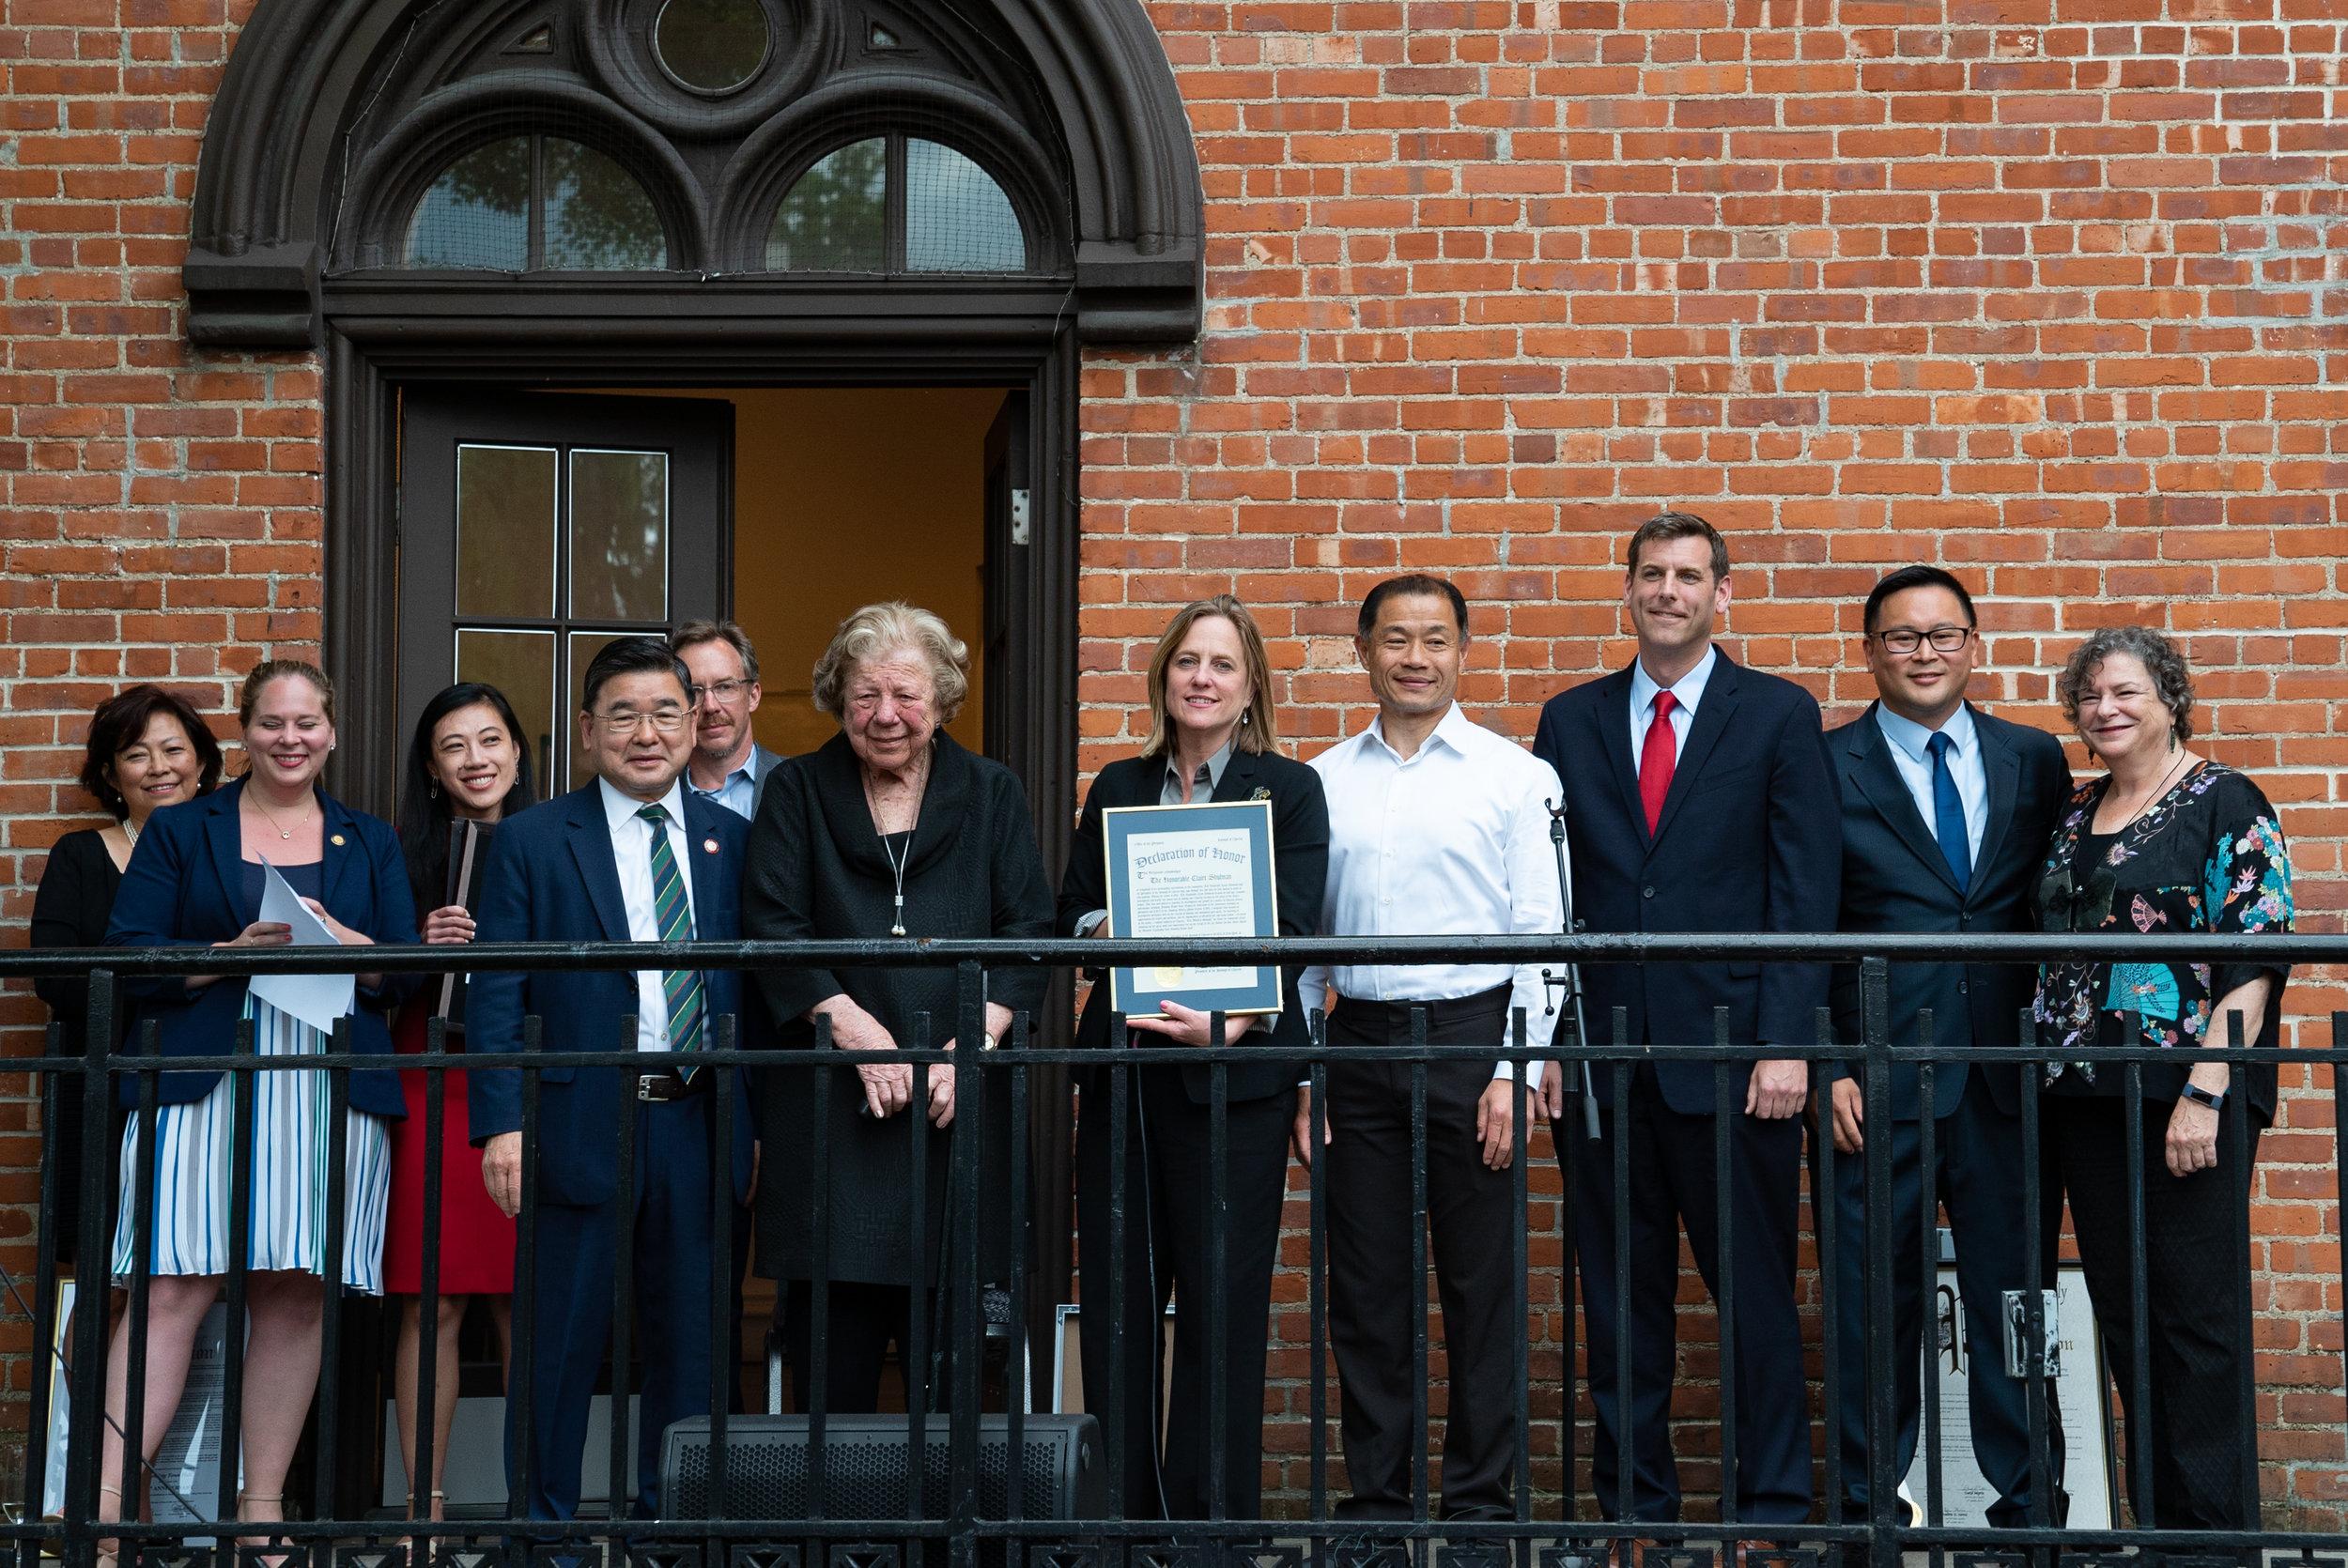 Flushing Town Hall held its 40th annual gala on June 6, 2019. Pictured (left to right) are: Emily Lin; Jordan Beberman; Sandra Ung; Peter Koo; Phil Ballman; Claire Shulman; Melinda Katz; John Liu; Ed Braunstein; Ron Kim; and, Ellen Kodadek.